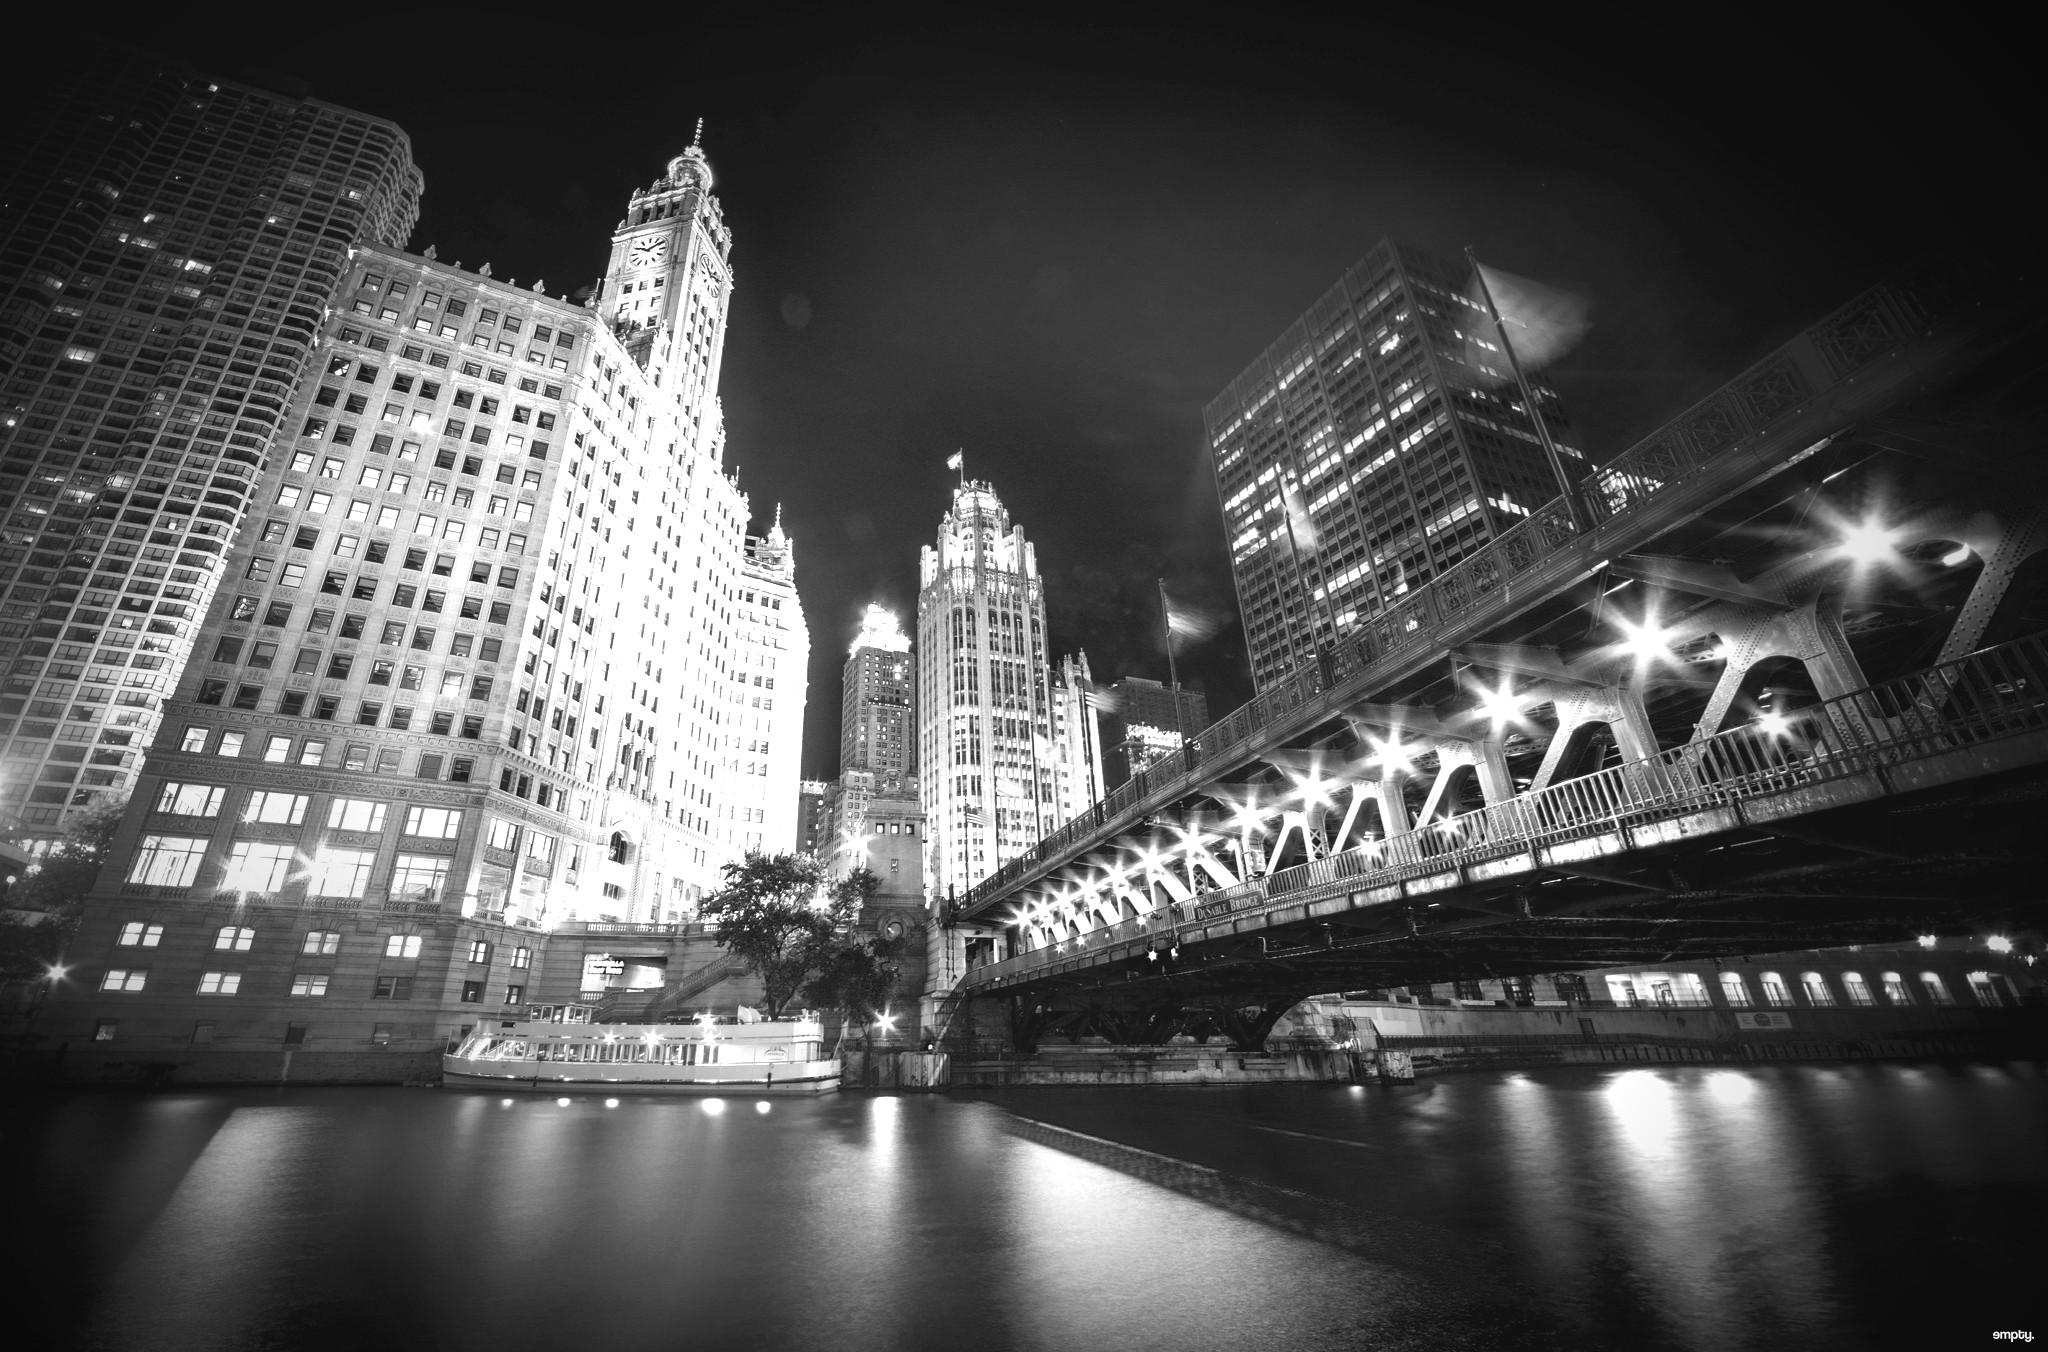 Wallpaper City Cityscape Night Architecture Reflection